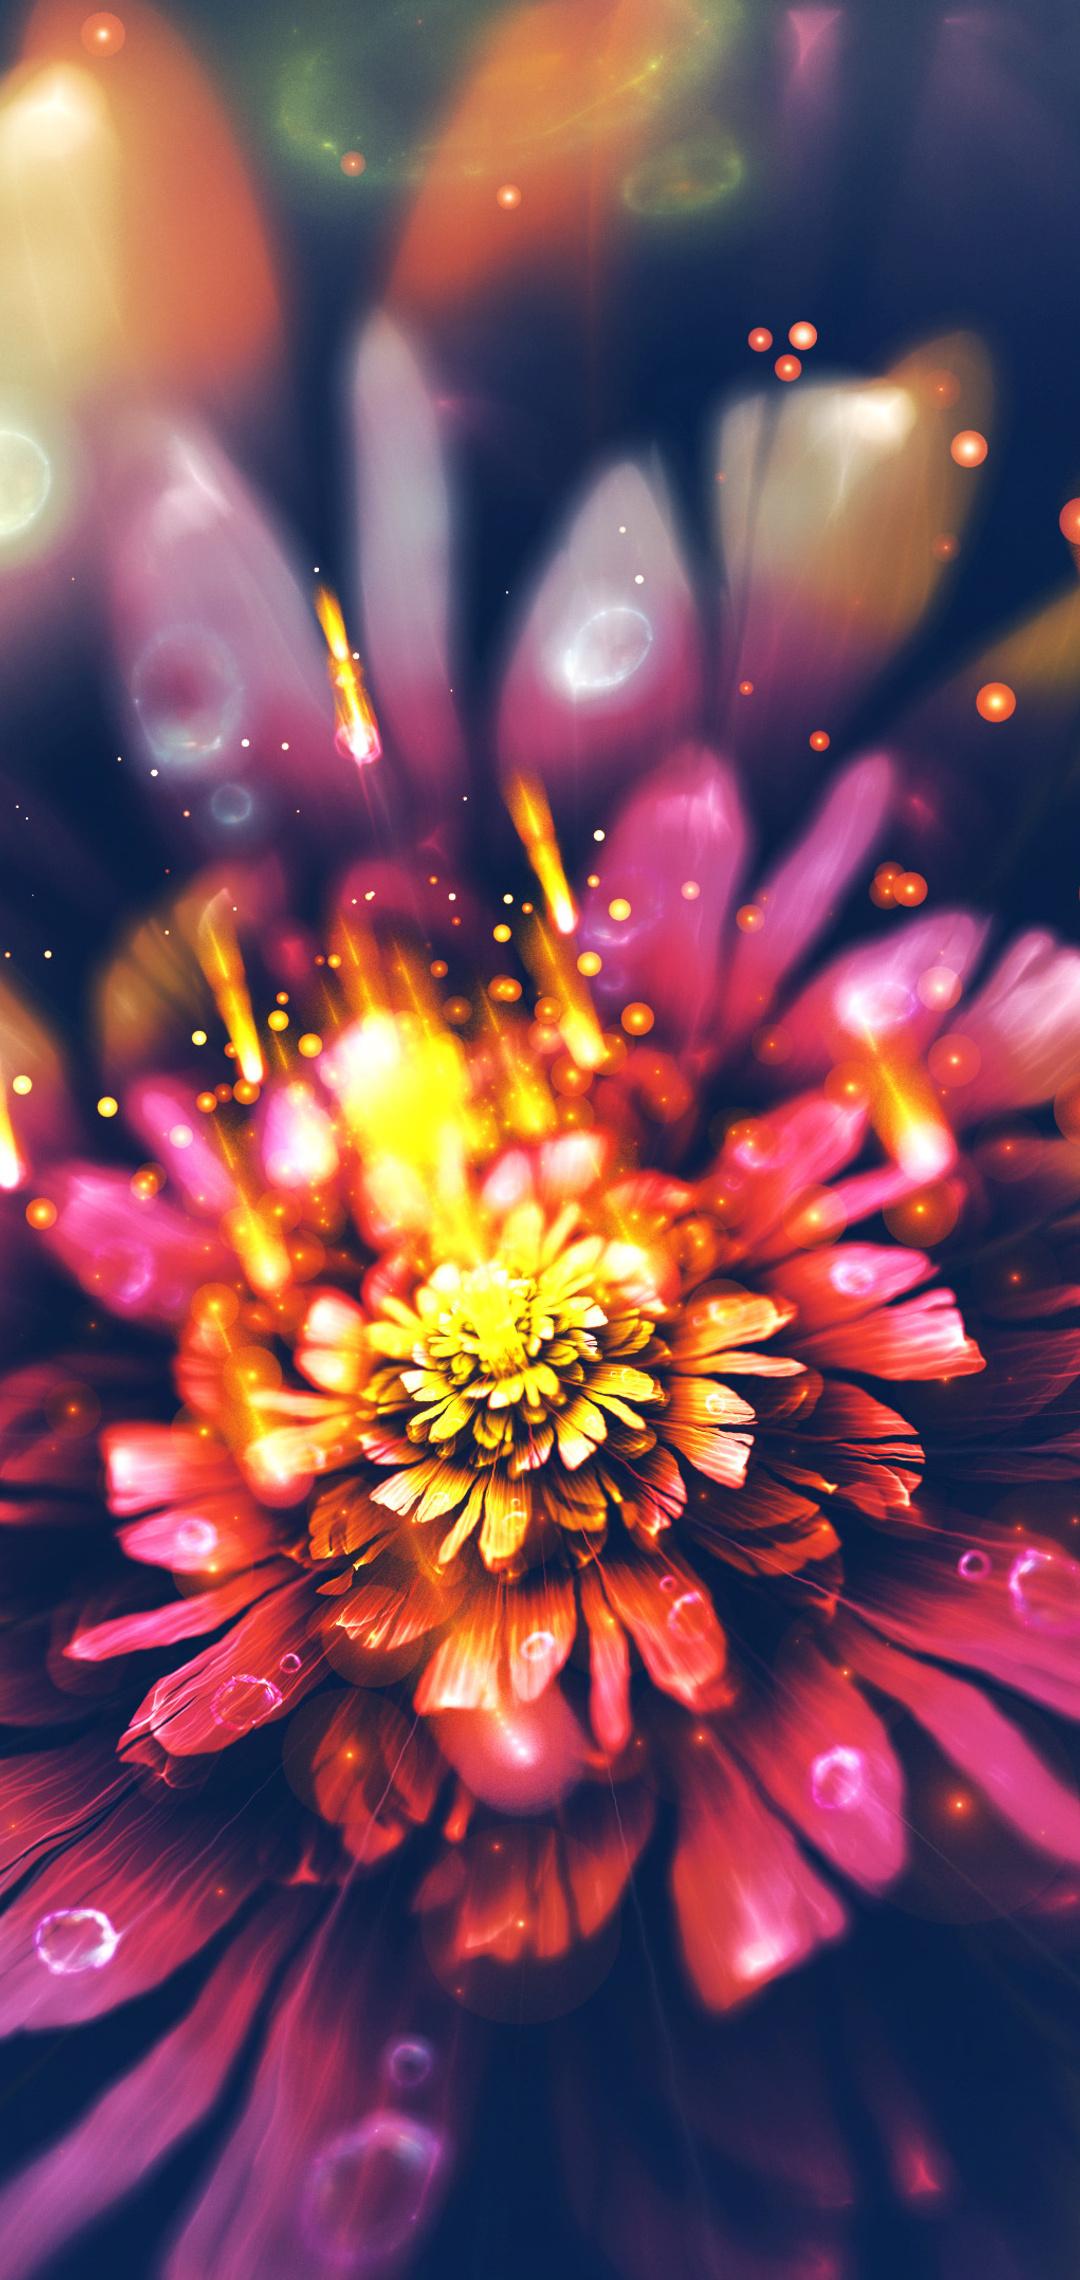 digital-flower-fractal-arts-4k-yl.jpg